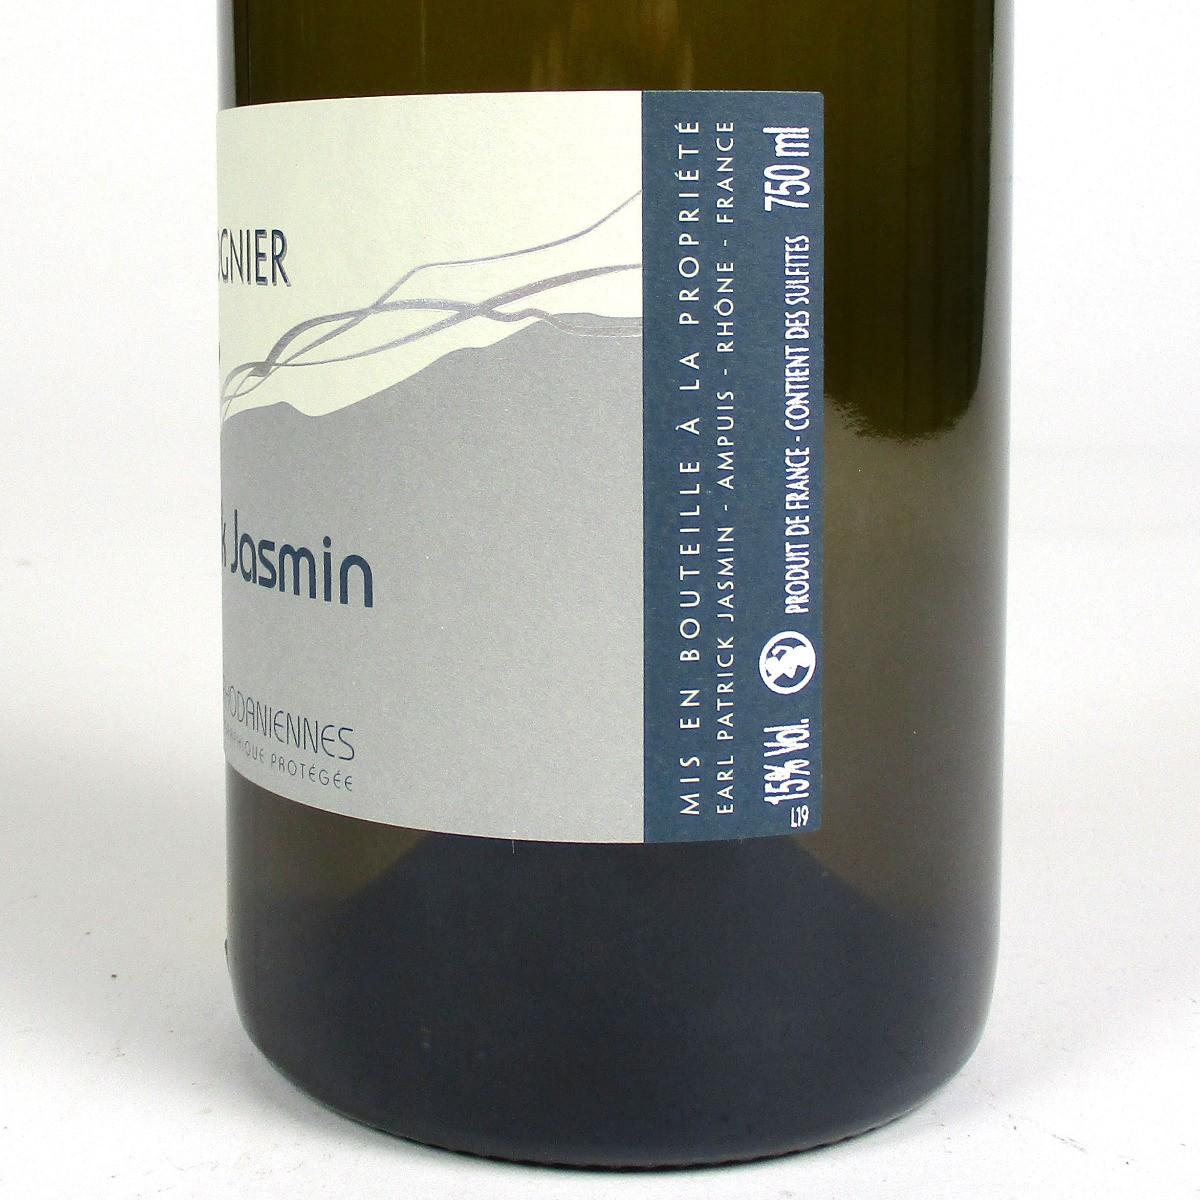 IGP Collines Rhodaniennes: Patrick Jasmin Viognier 2019 - Bottle Side Label